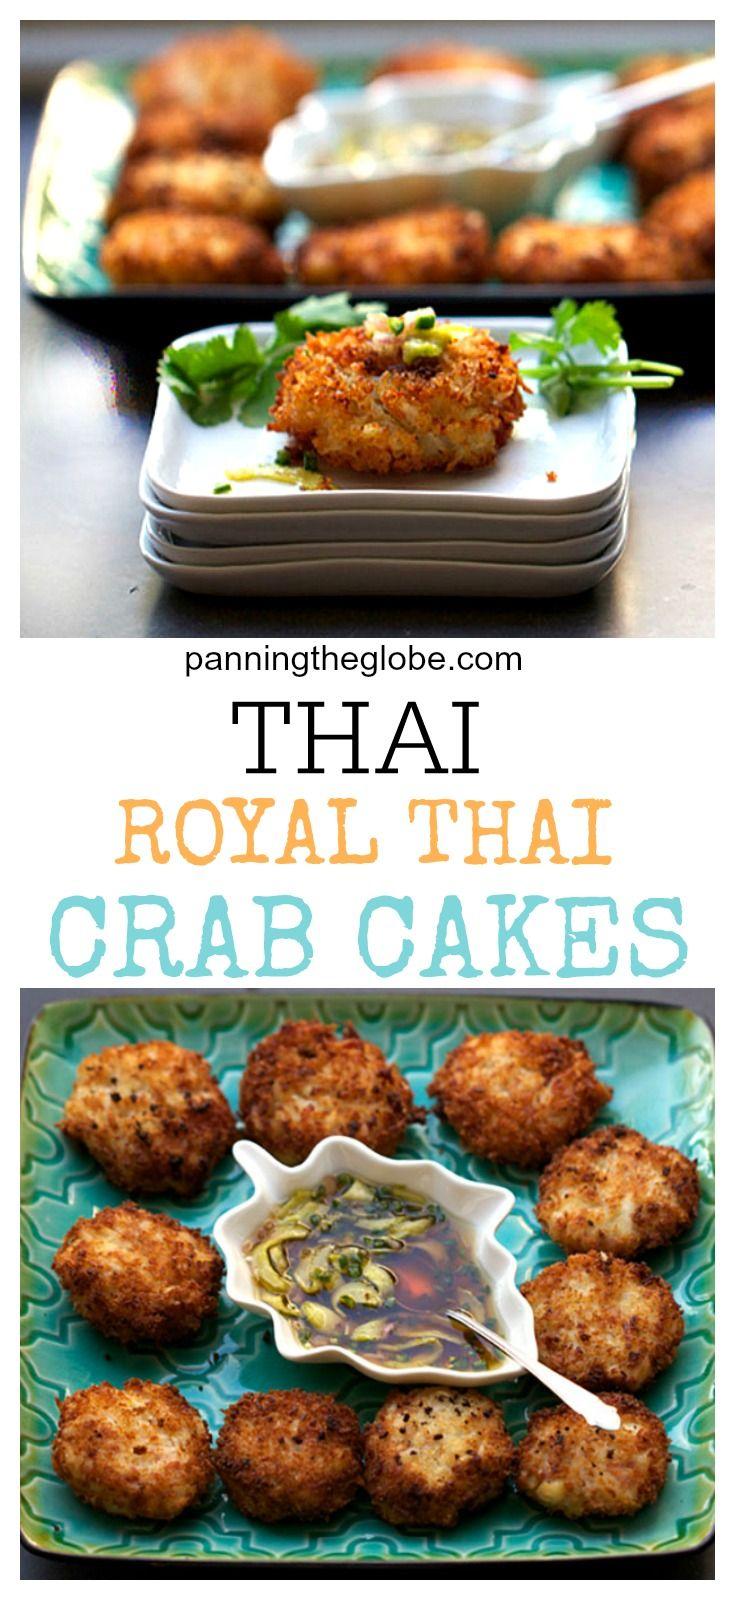 Royal Thai Crab Cakes